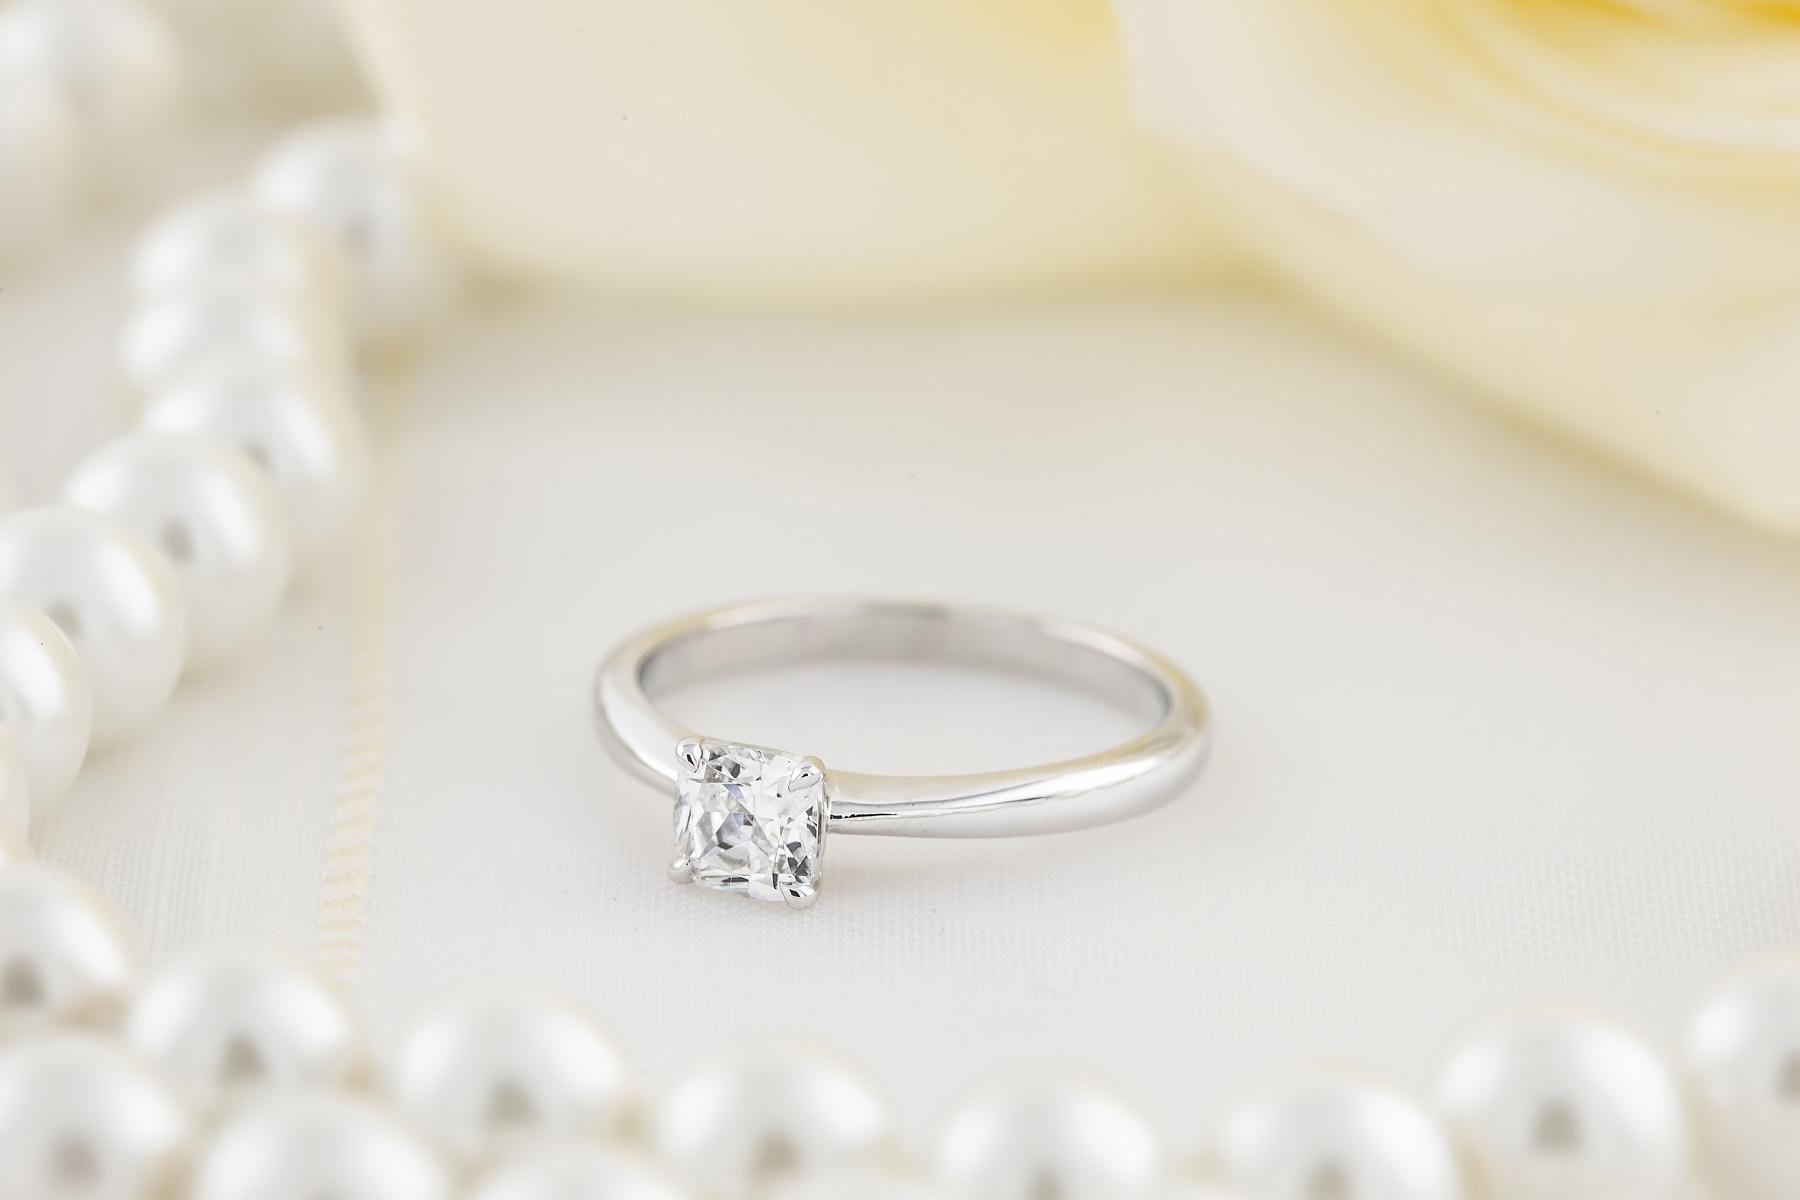 Inel de Logodna Solitaire Dama Aur Alb 18kt cu un Diamant Cushion in Setare cu 4 Gheare-img1